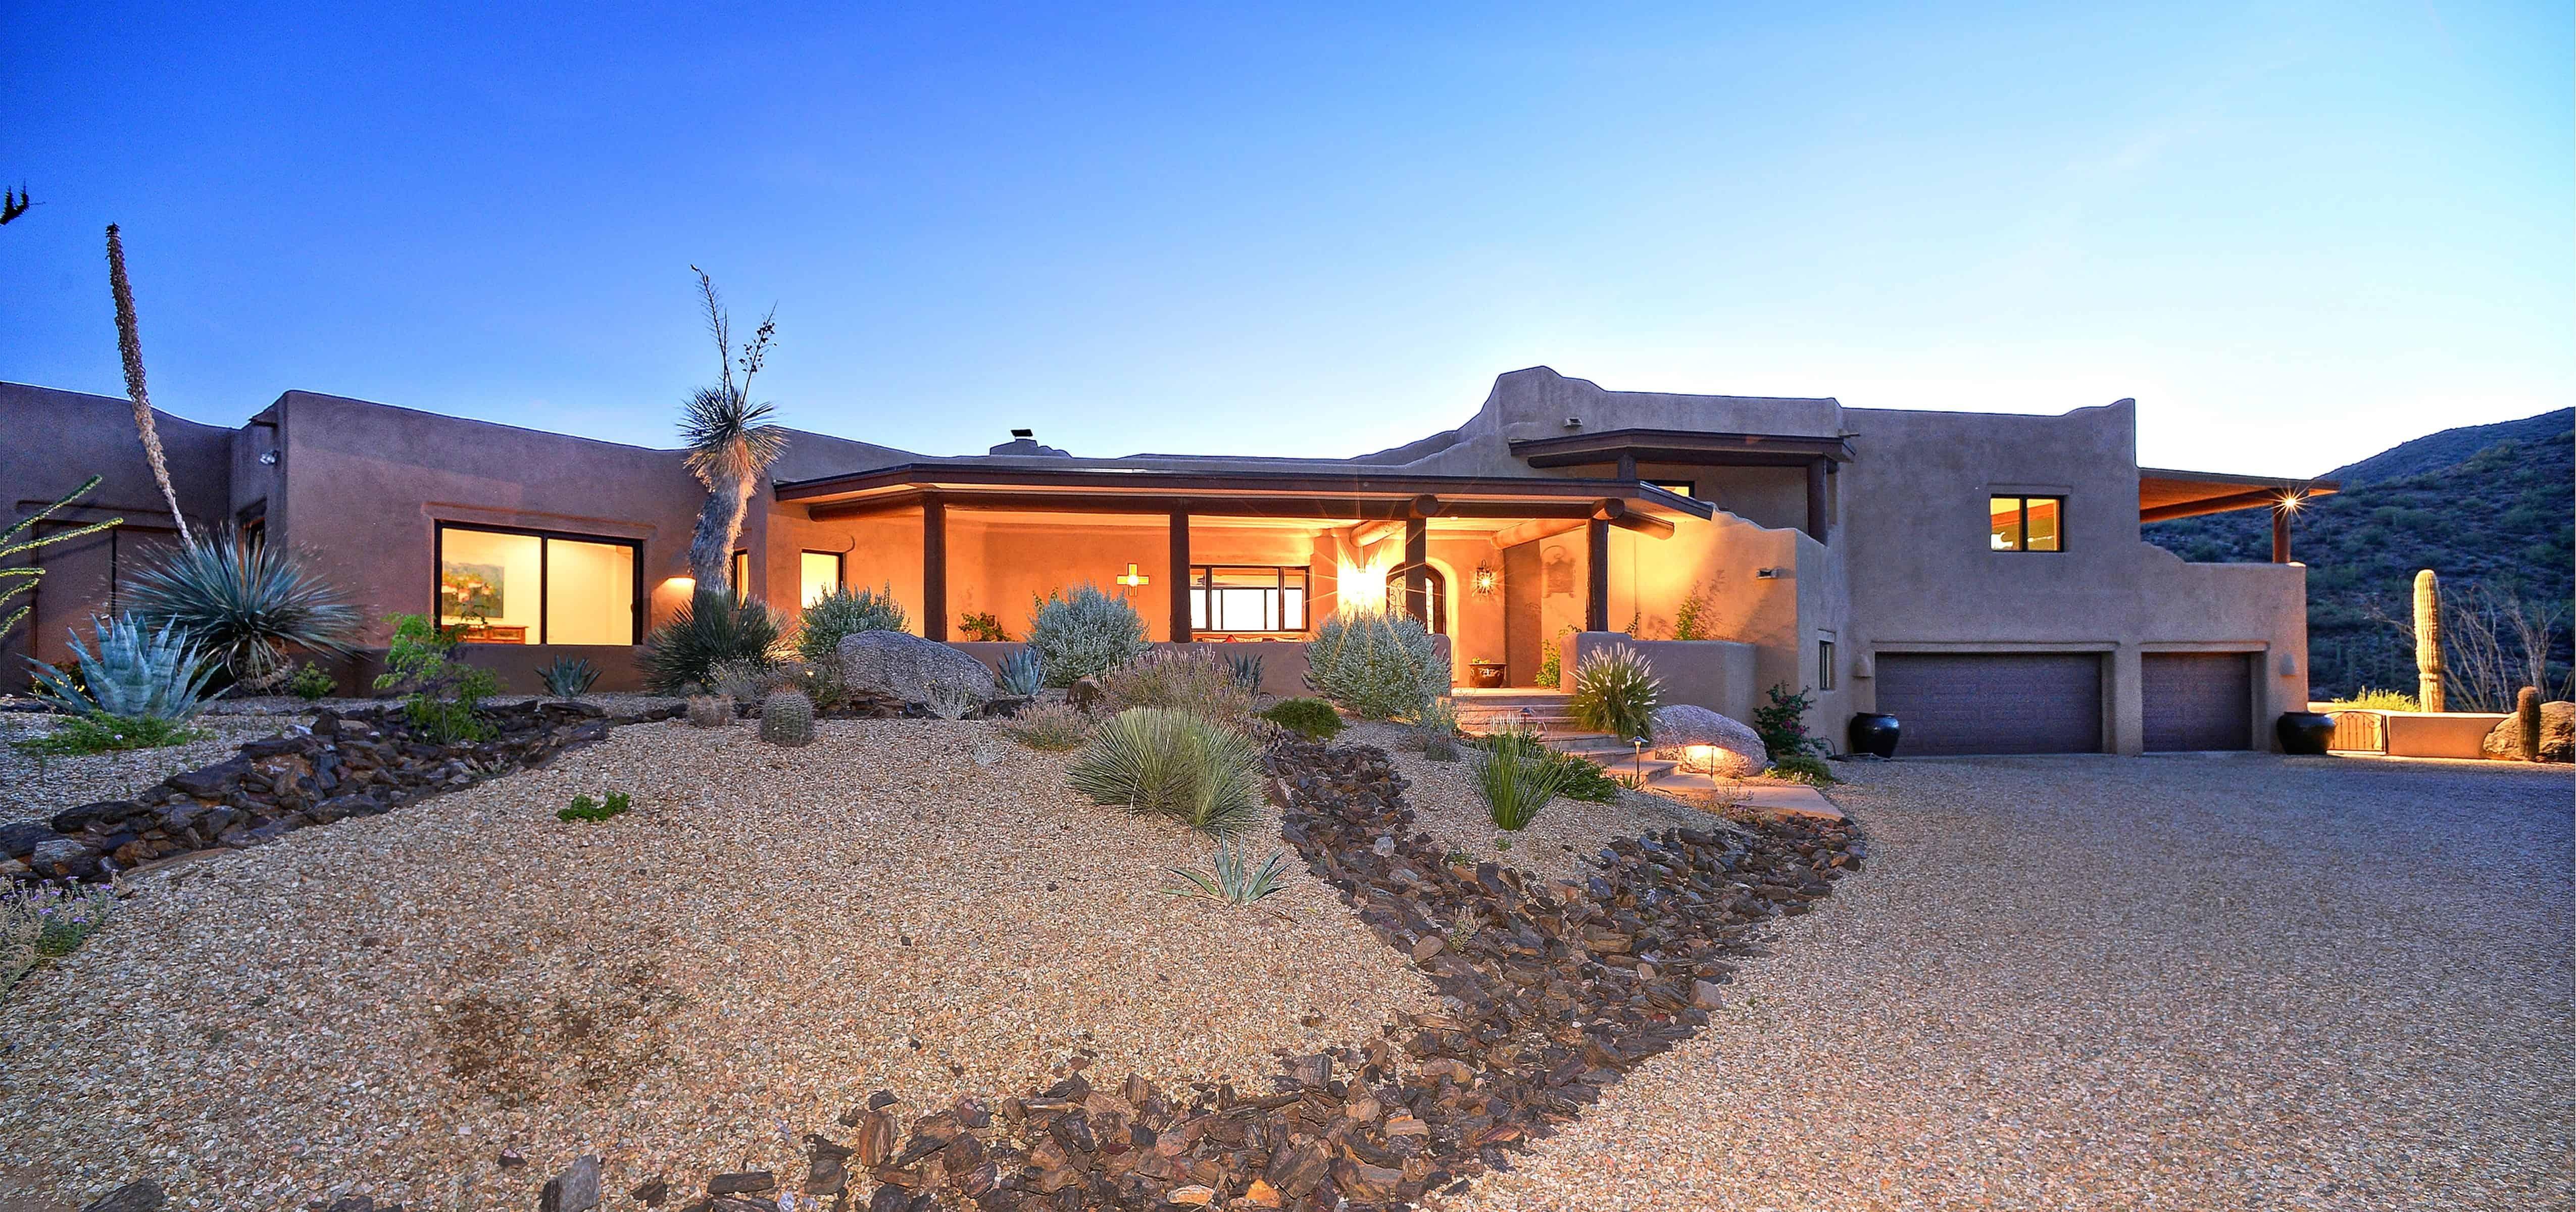 Scottsdale AZ Luxury Home